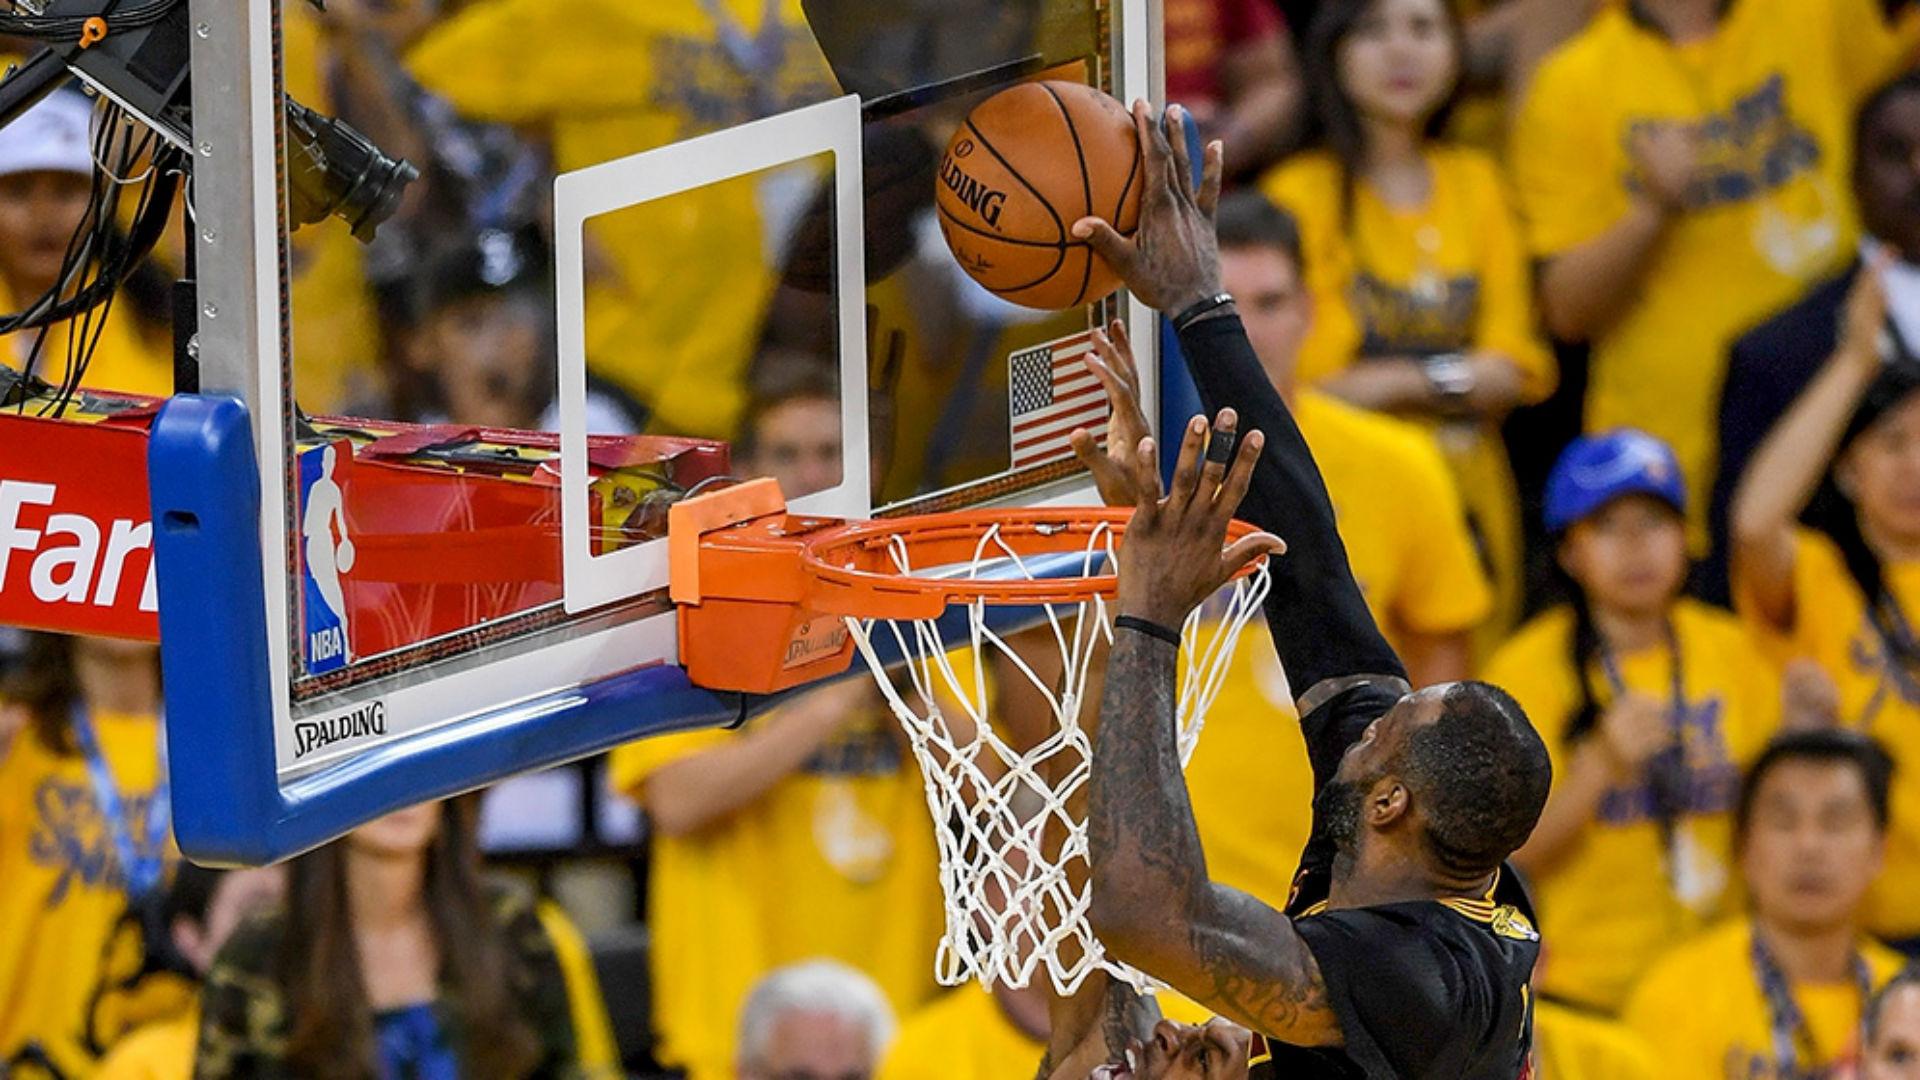 Lebron James Dope Pics: Even Andre Iguodala Thought LeBron James' NBA Finals Block